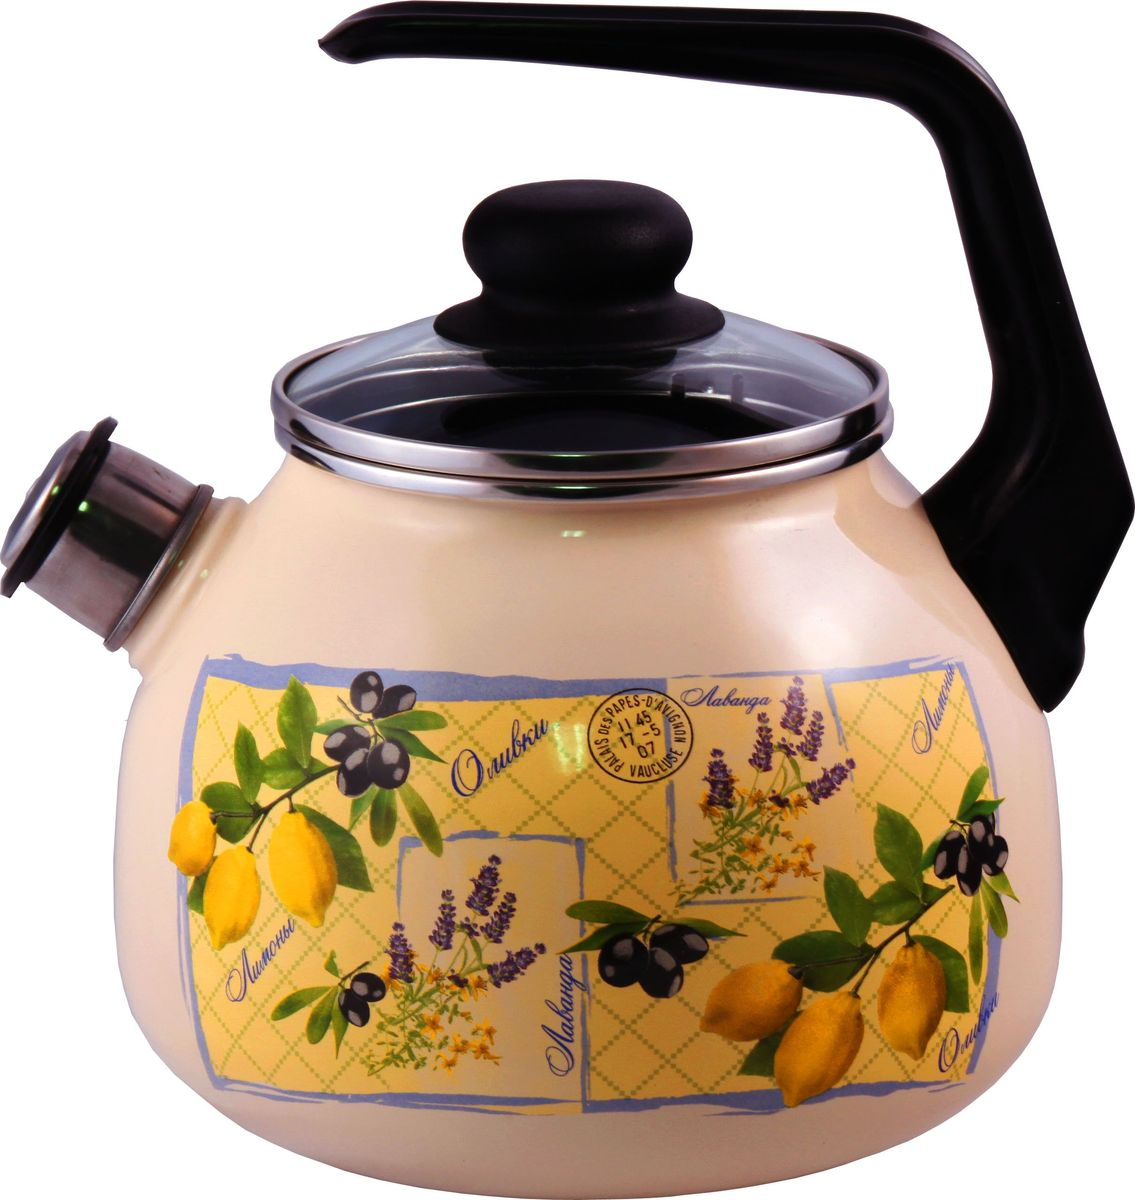 Чайник Appetite Citrus, со свистком, 3 л. 4с209я4с209яЧайник объем 3,0л со свистком Citrus материал: эмаль